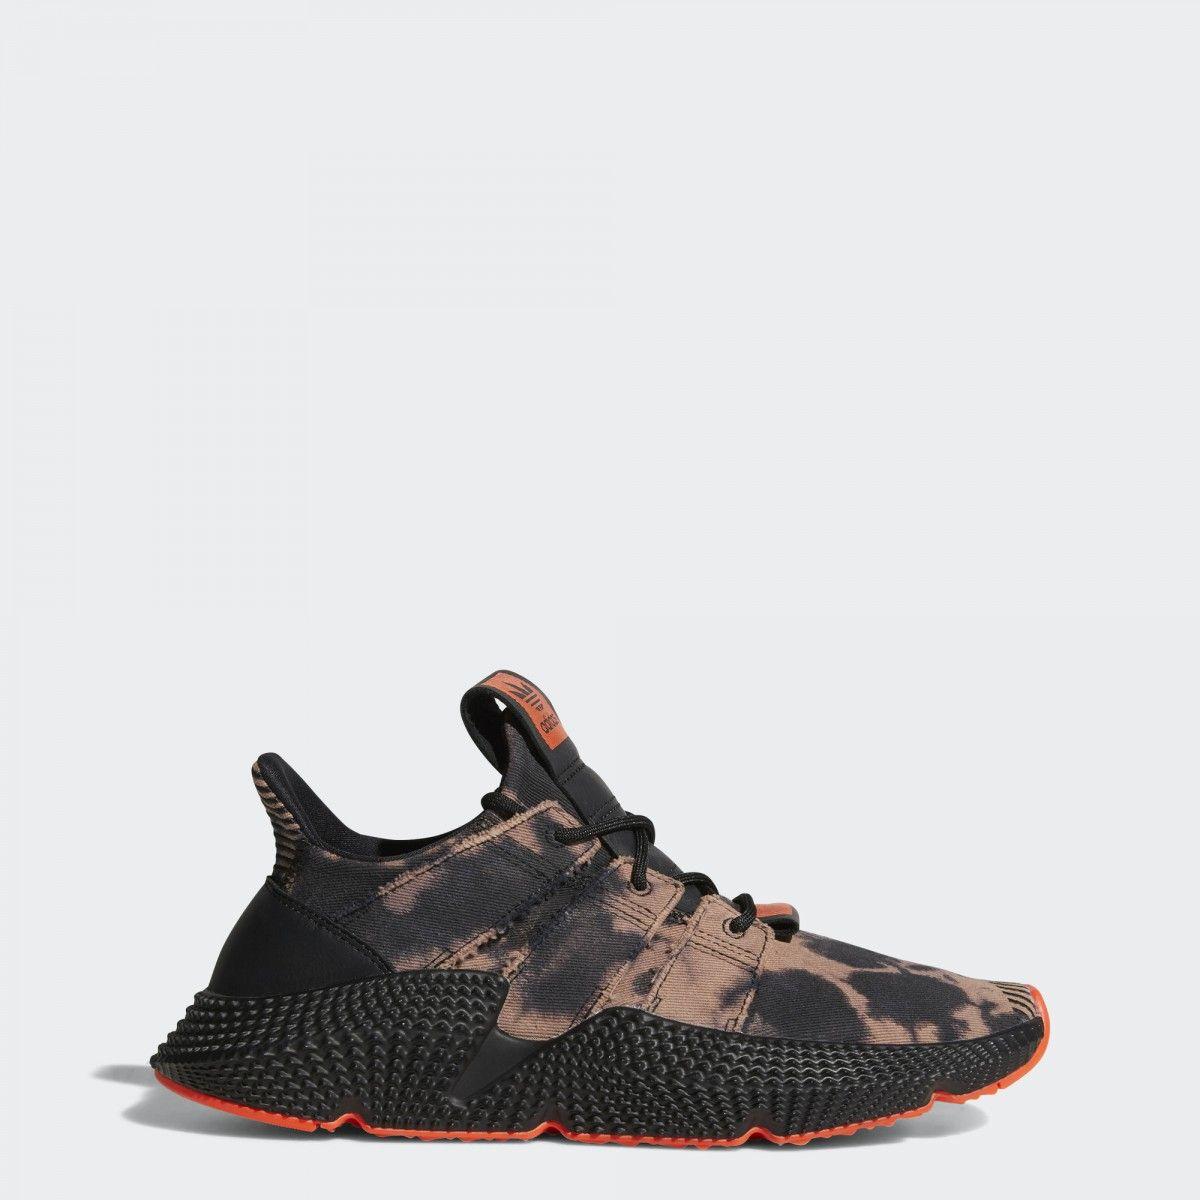 Adidas Men's Originals Prophere Casual Walking Bounce Boost Shoes Sneakers